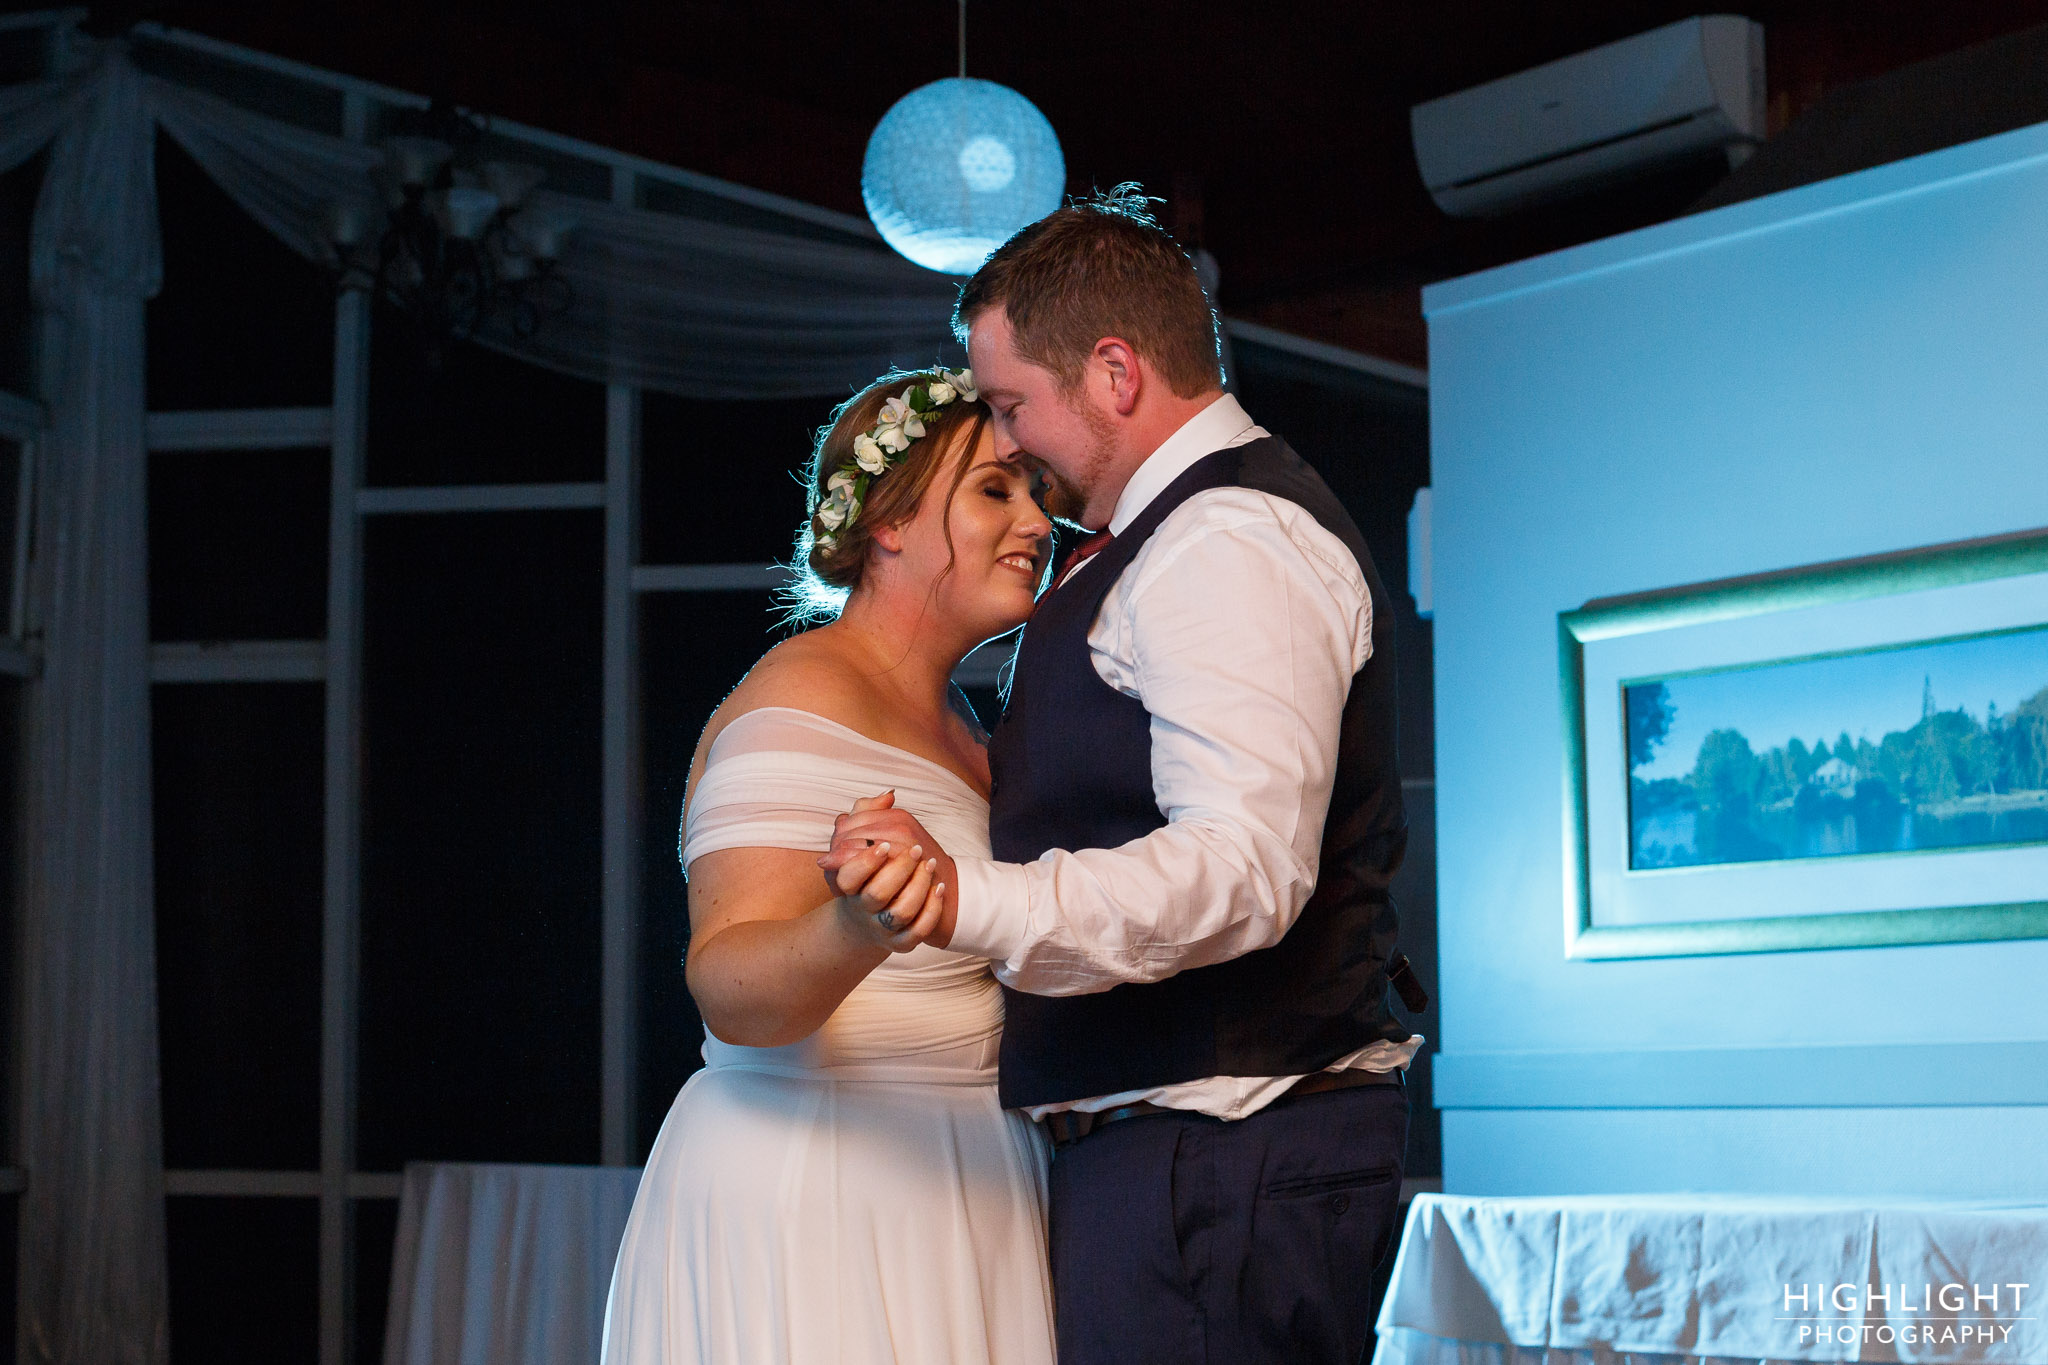 Highlight-wedding-photography-new-zealand-palmerston-north-130.jpg